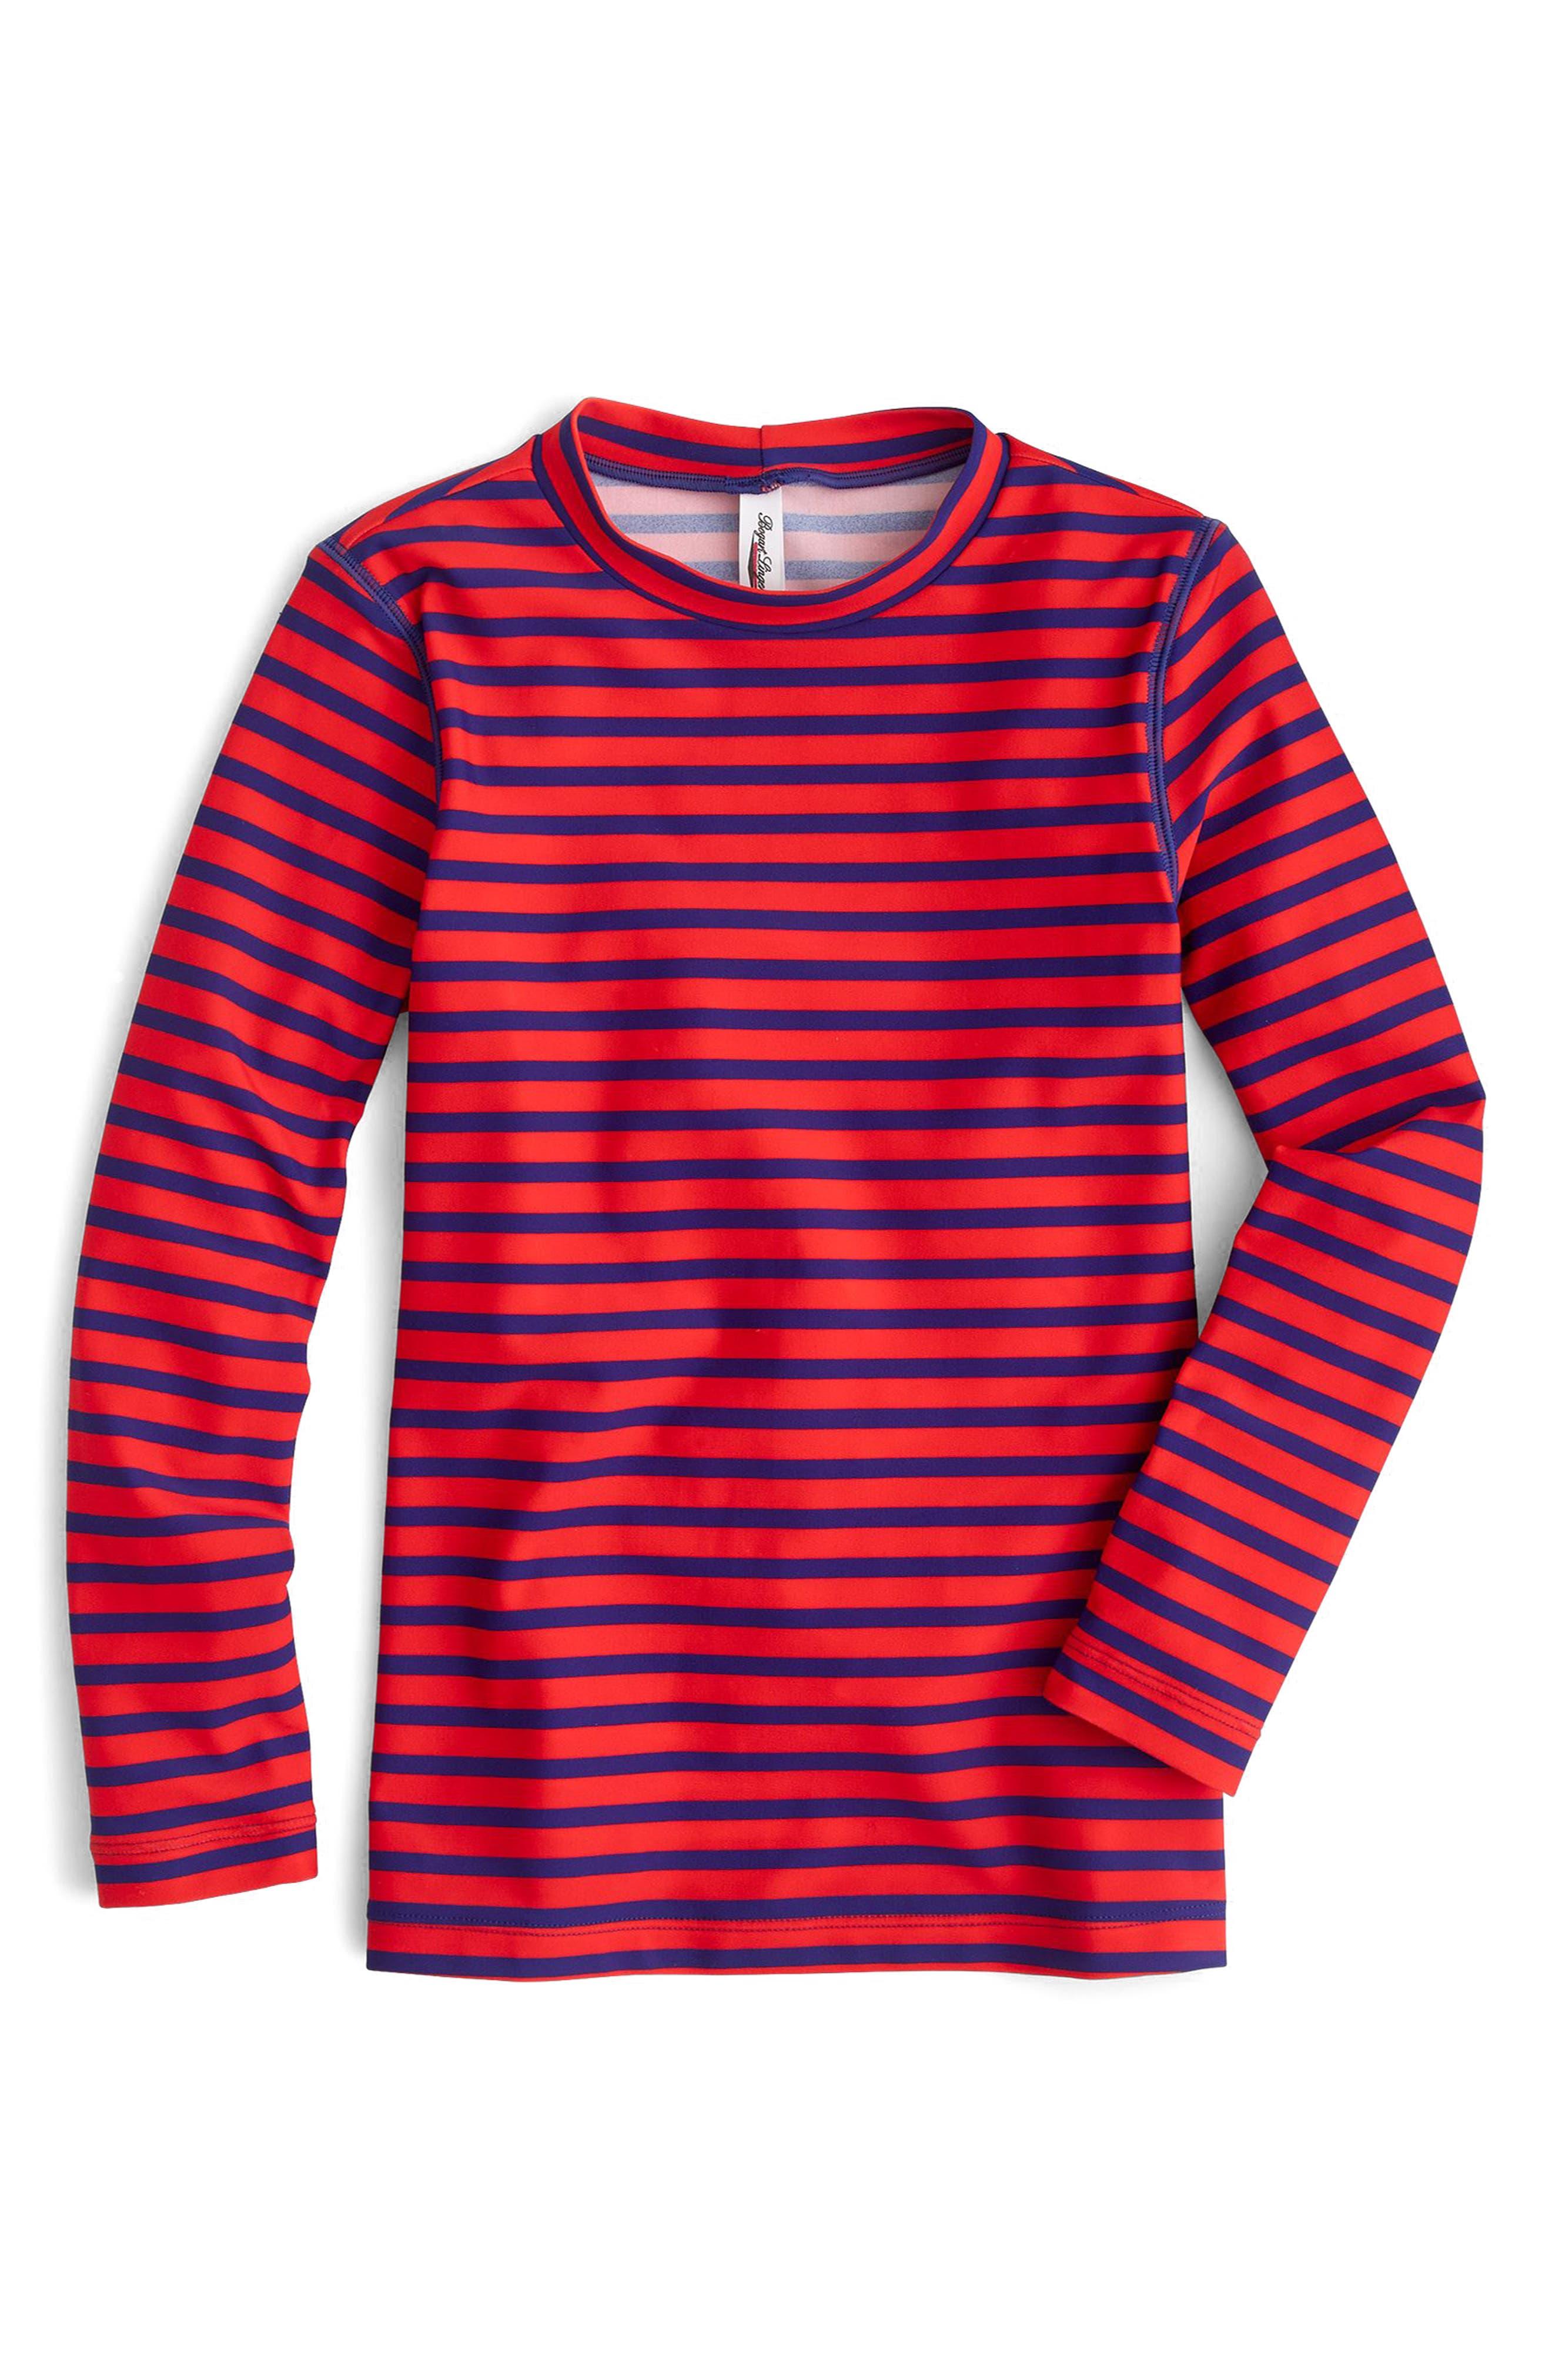 Stripe Long Sleeve Rashguard,                             Main thumbnail 1, color,                             Indigo Flame